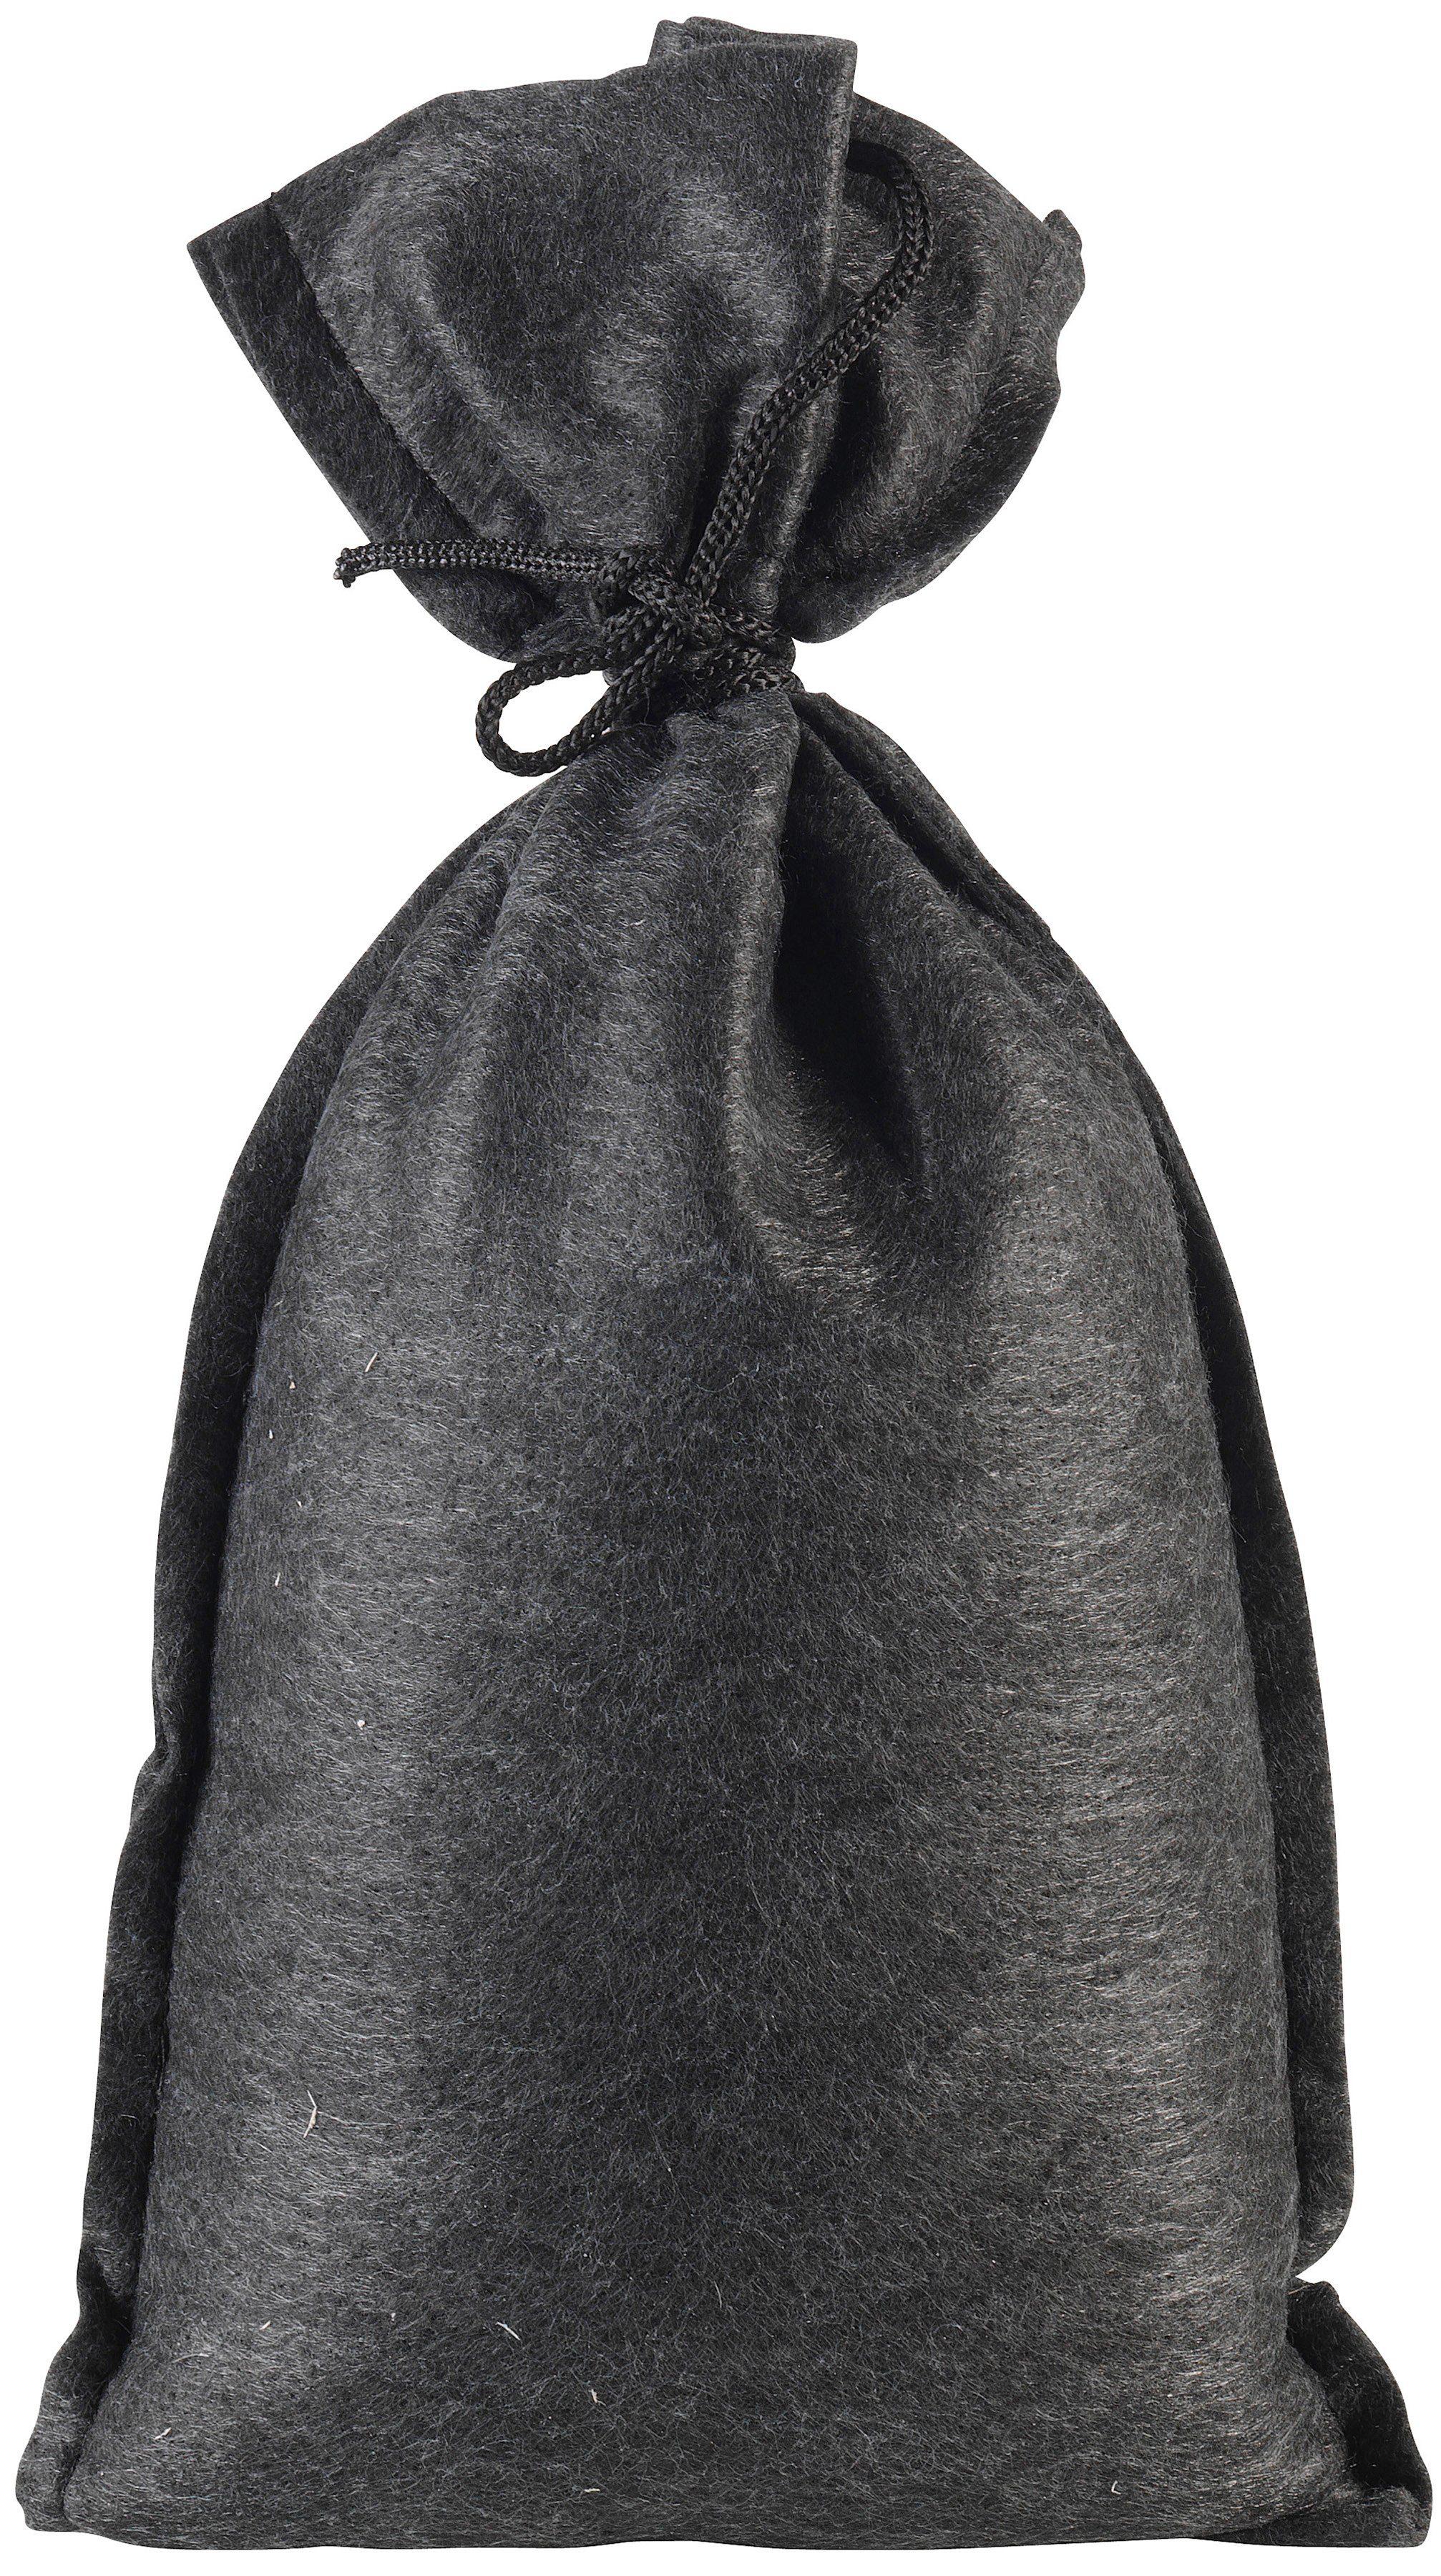 WENKO Luftentfeuchter »Luftentfeuchter-Sack«, 1 kg